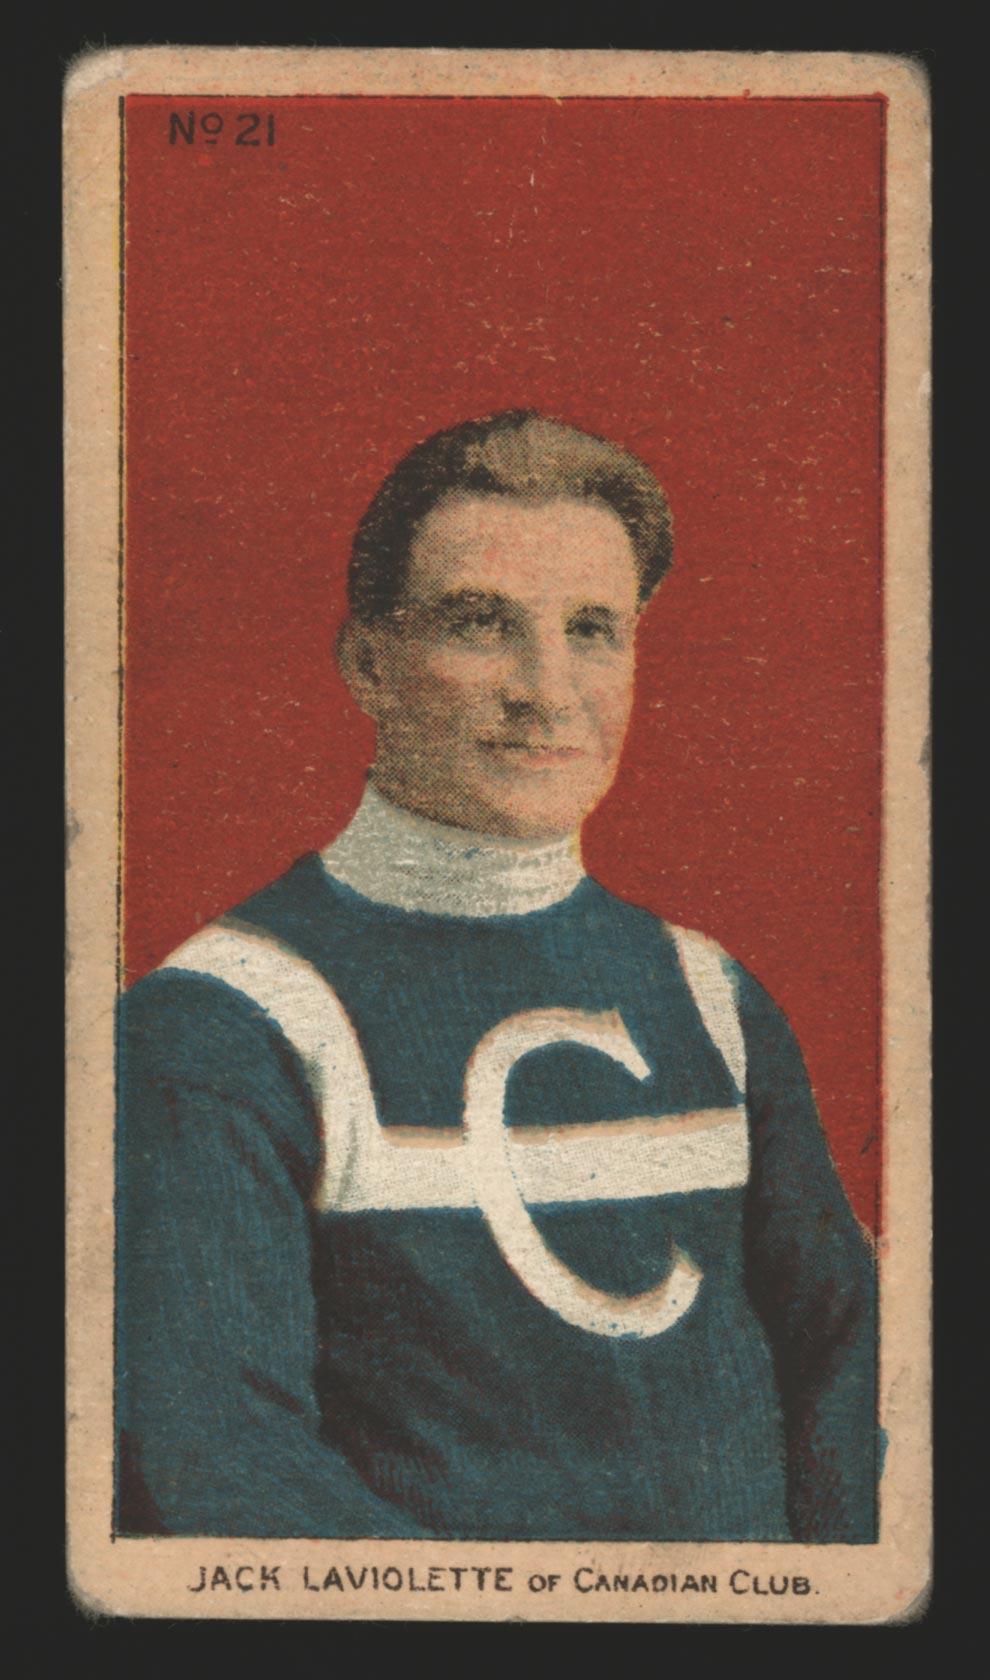 BMW Sportscards   Jack Laviolette #21   1910-1911 C56 Imperial Tobacco Hockey